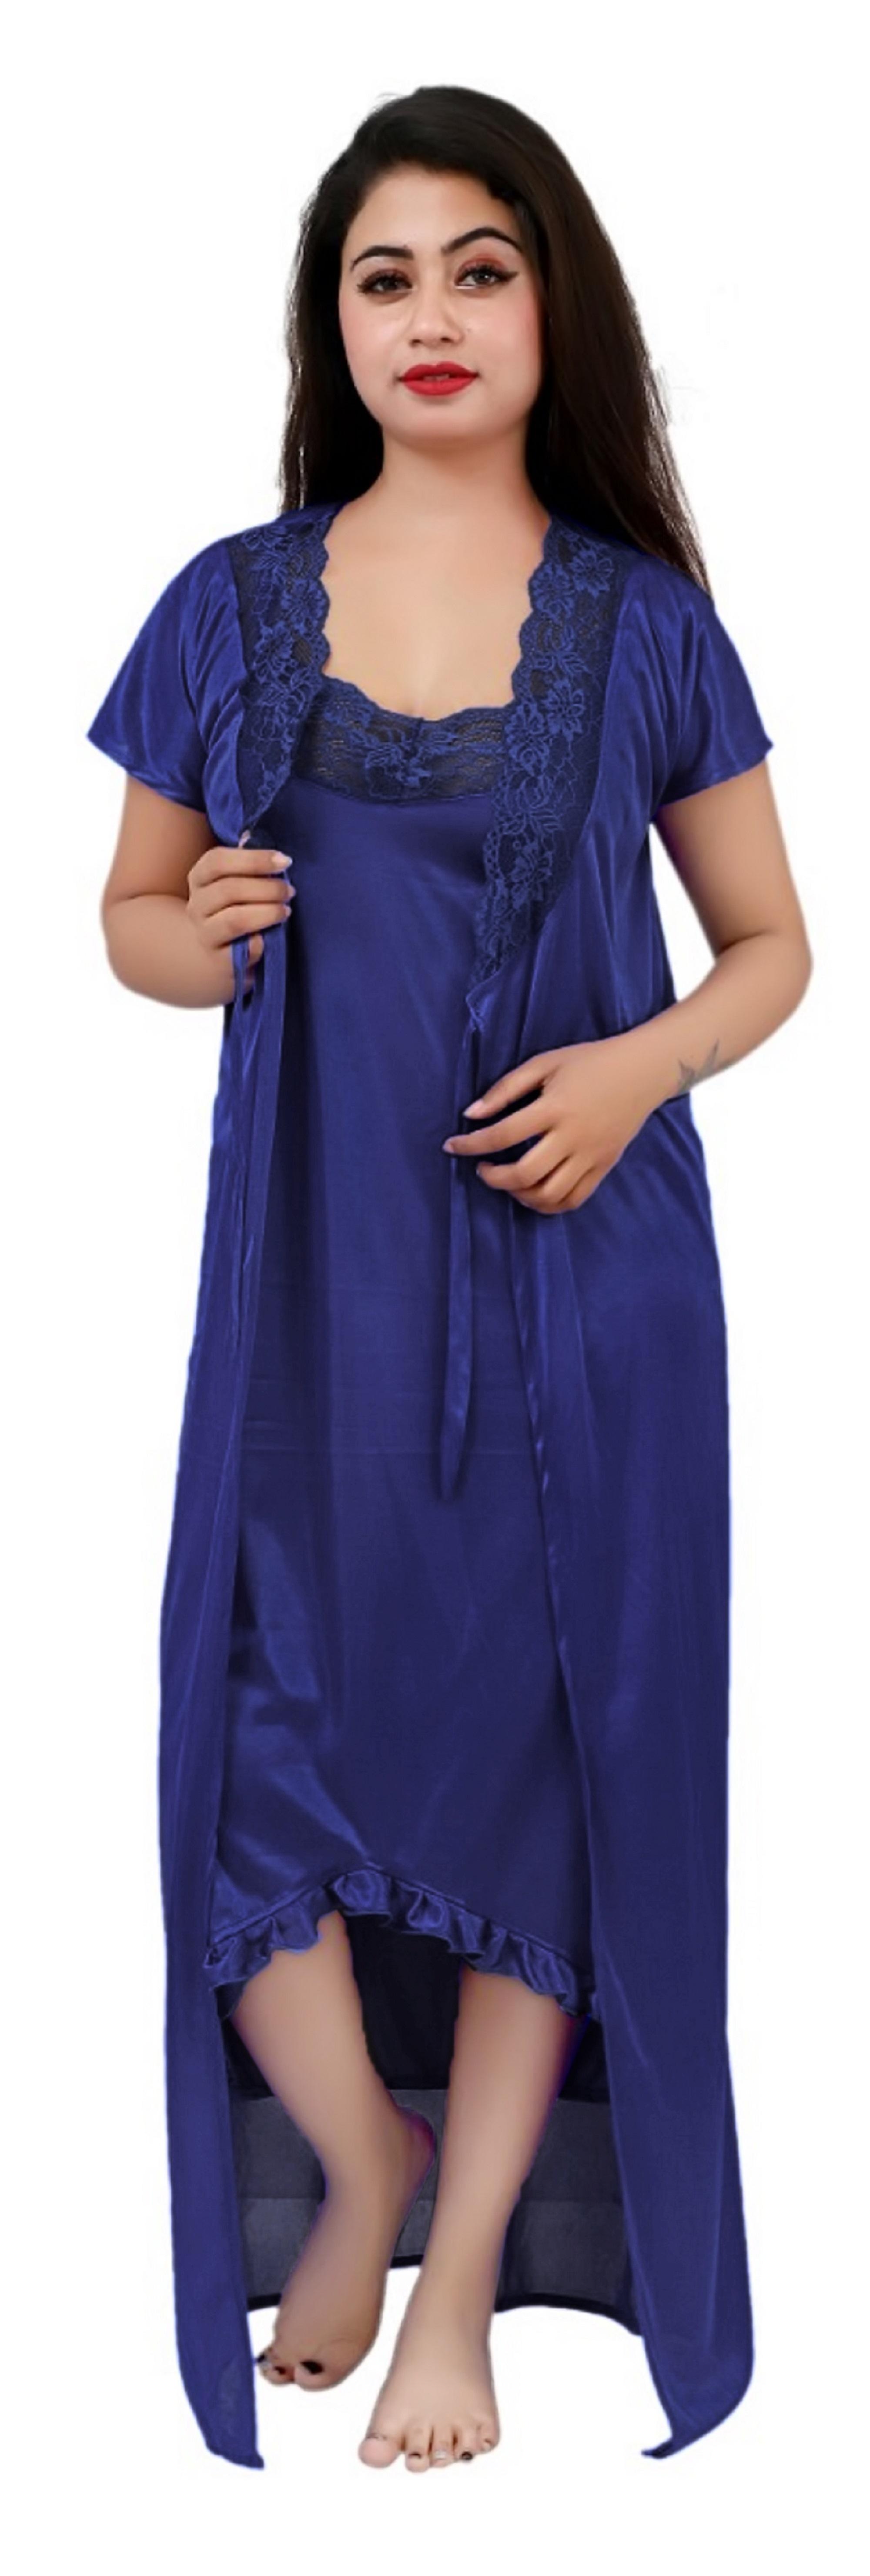 Ladies 4 Piece Fancy Night Dress 4 Piece Set